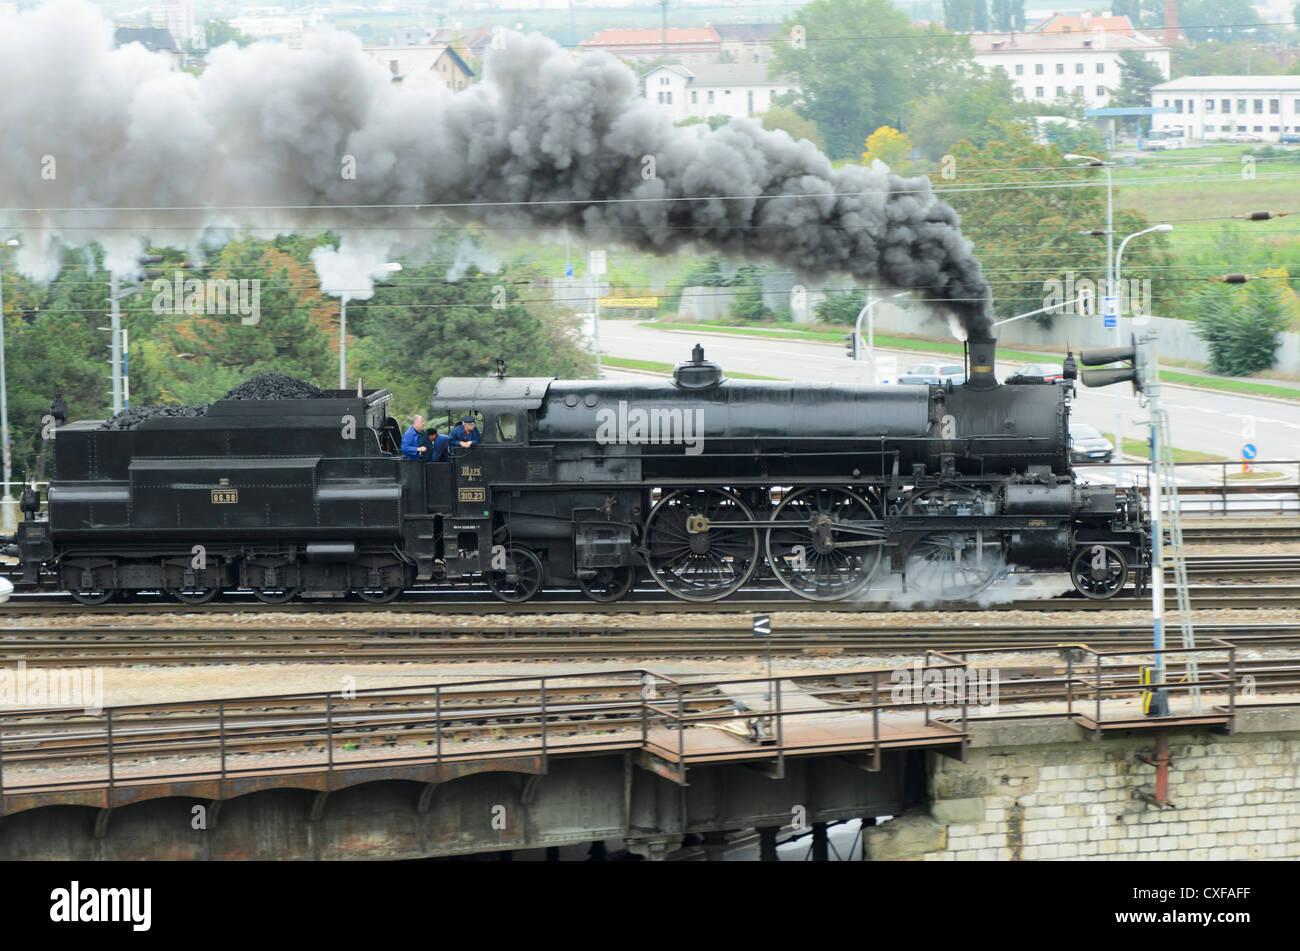 1911 Steam Engine 310.23 - Stock Image